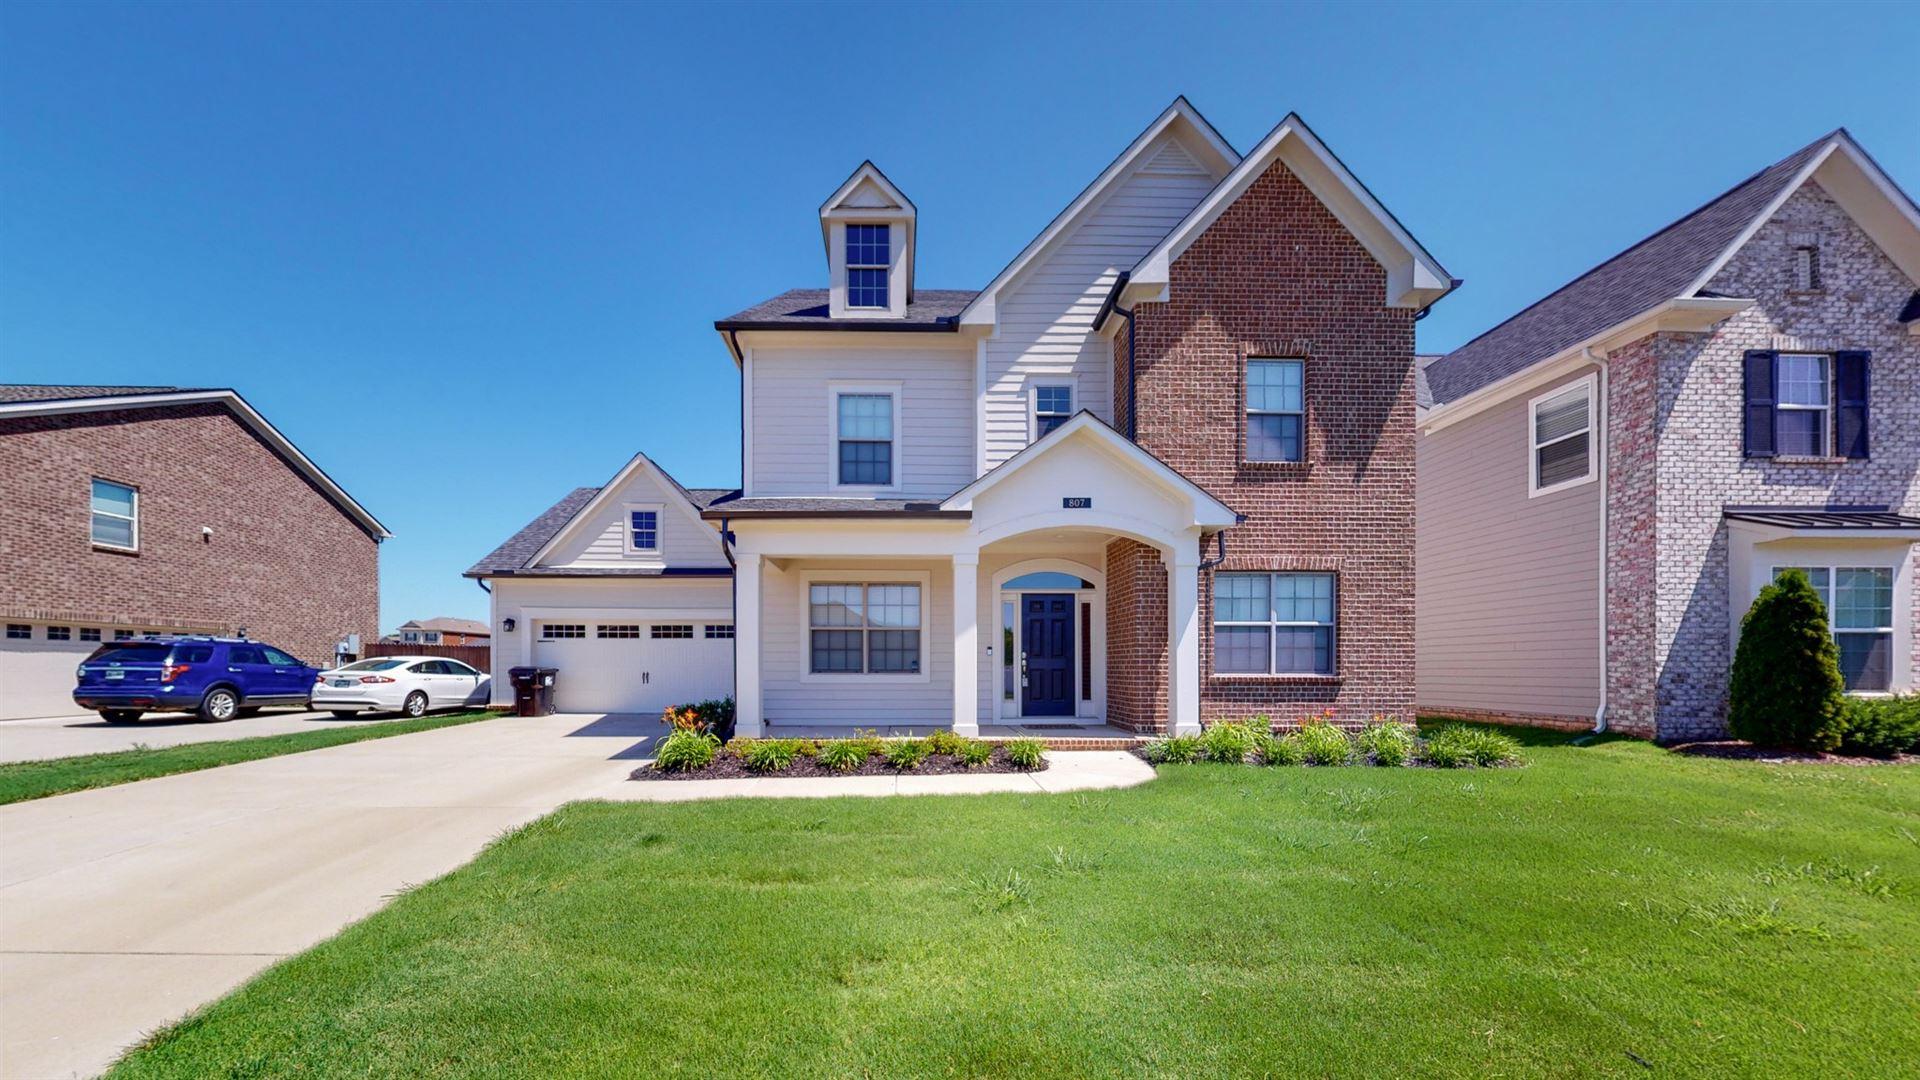 807 Sapphire Dr, Murfreesboro, TN 37128 - MLS#: 2263652